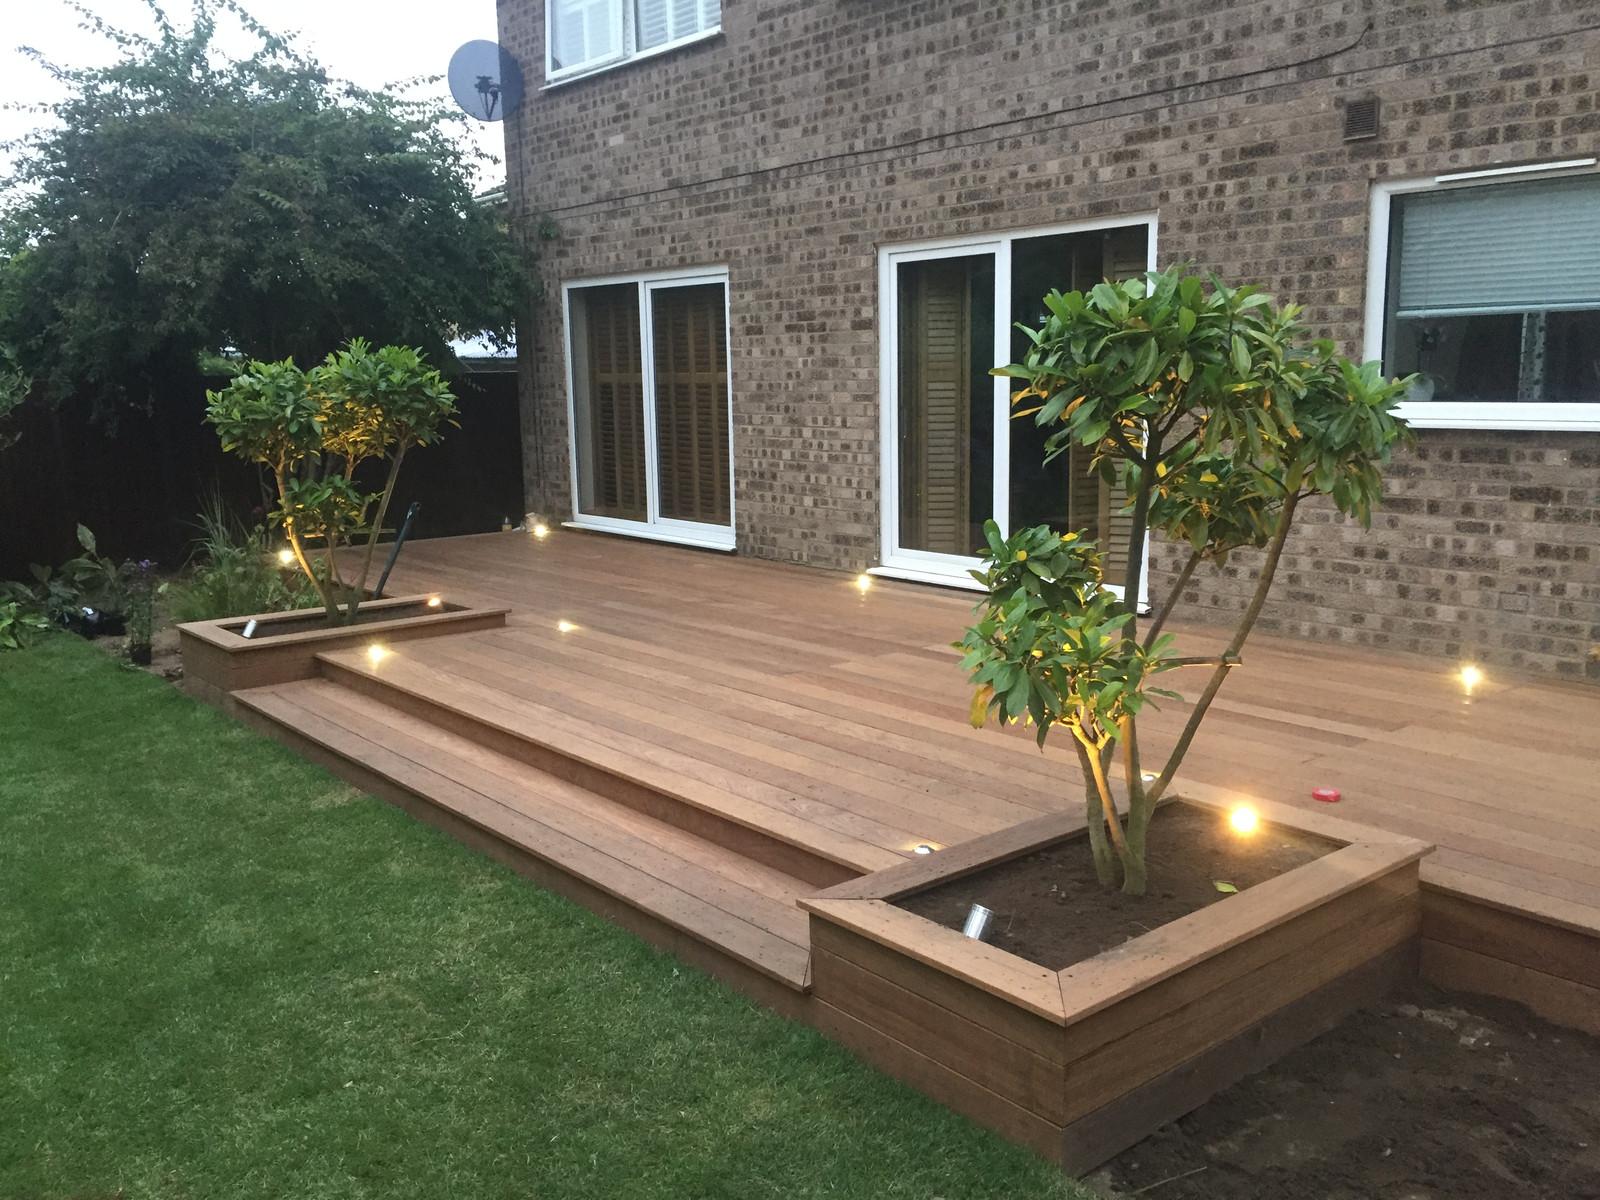 Garden design lighting landscaping norfolk stainless steel luxr garden deck light aloadofball Choice Image